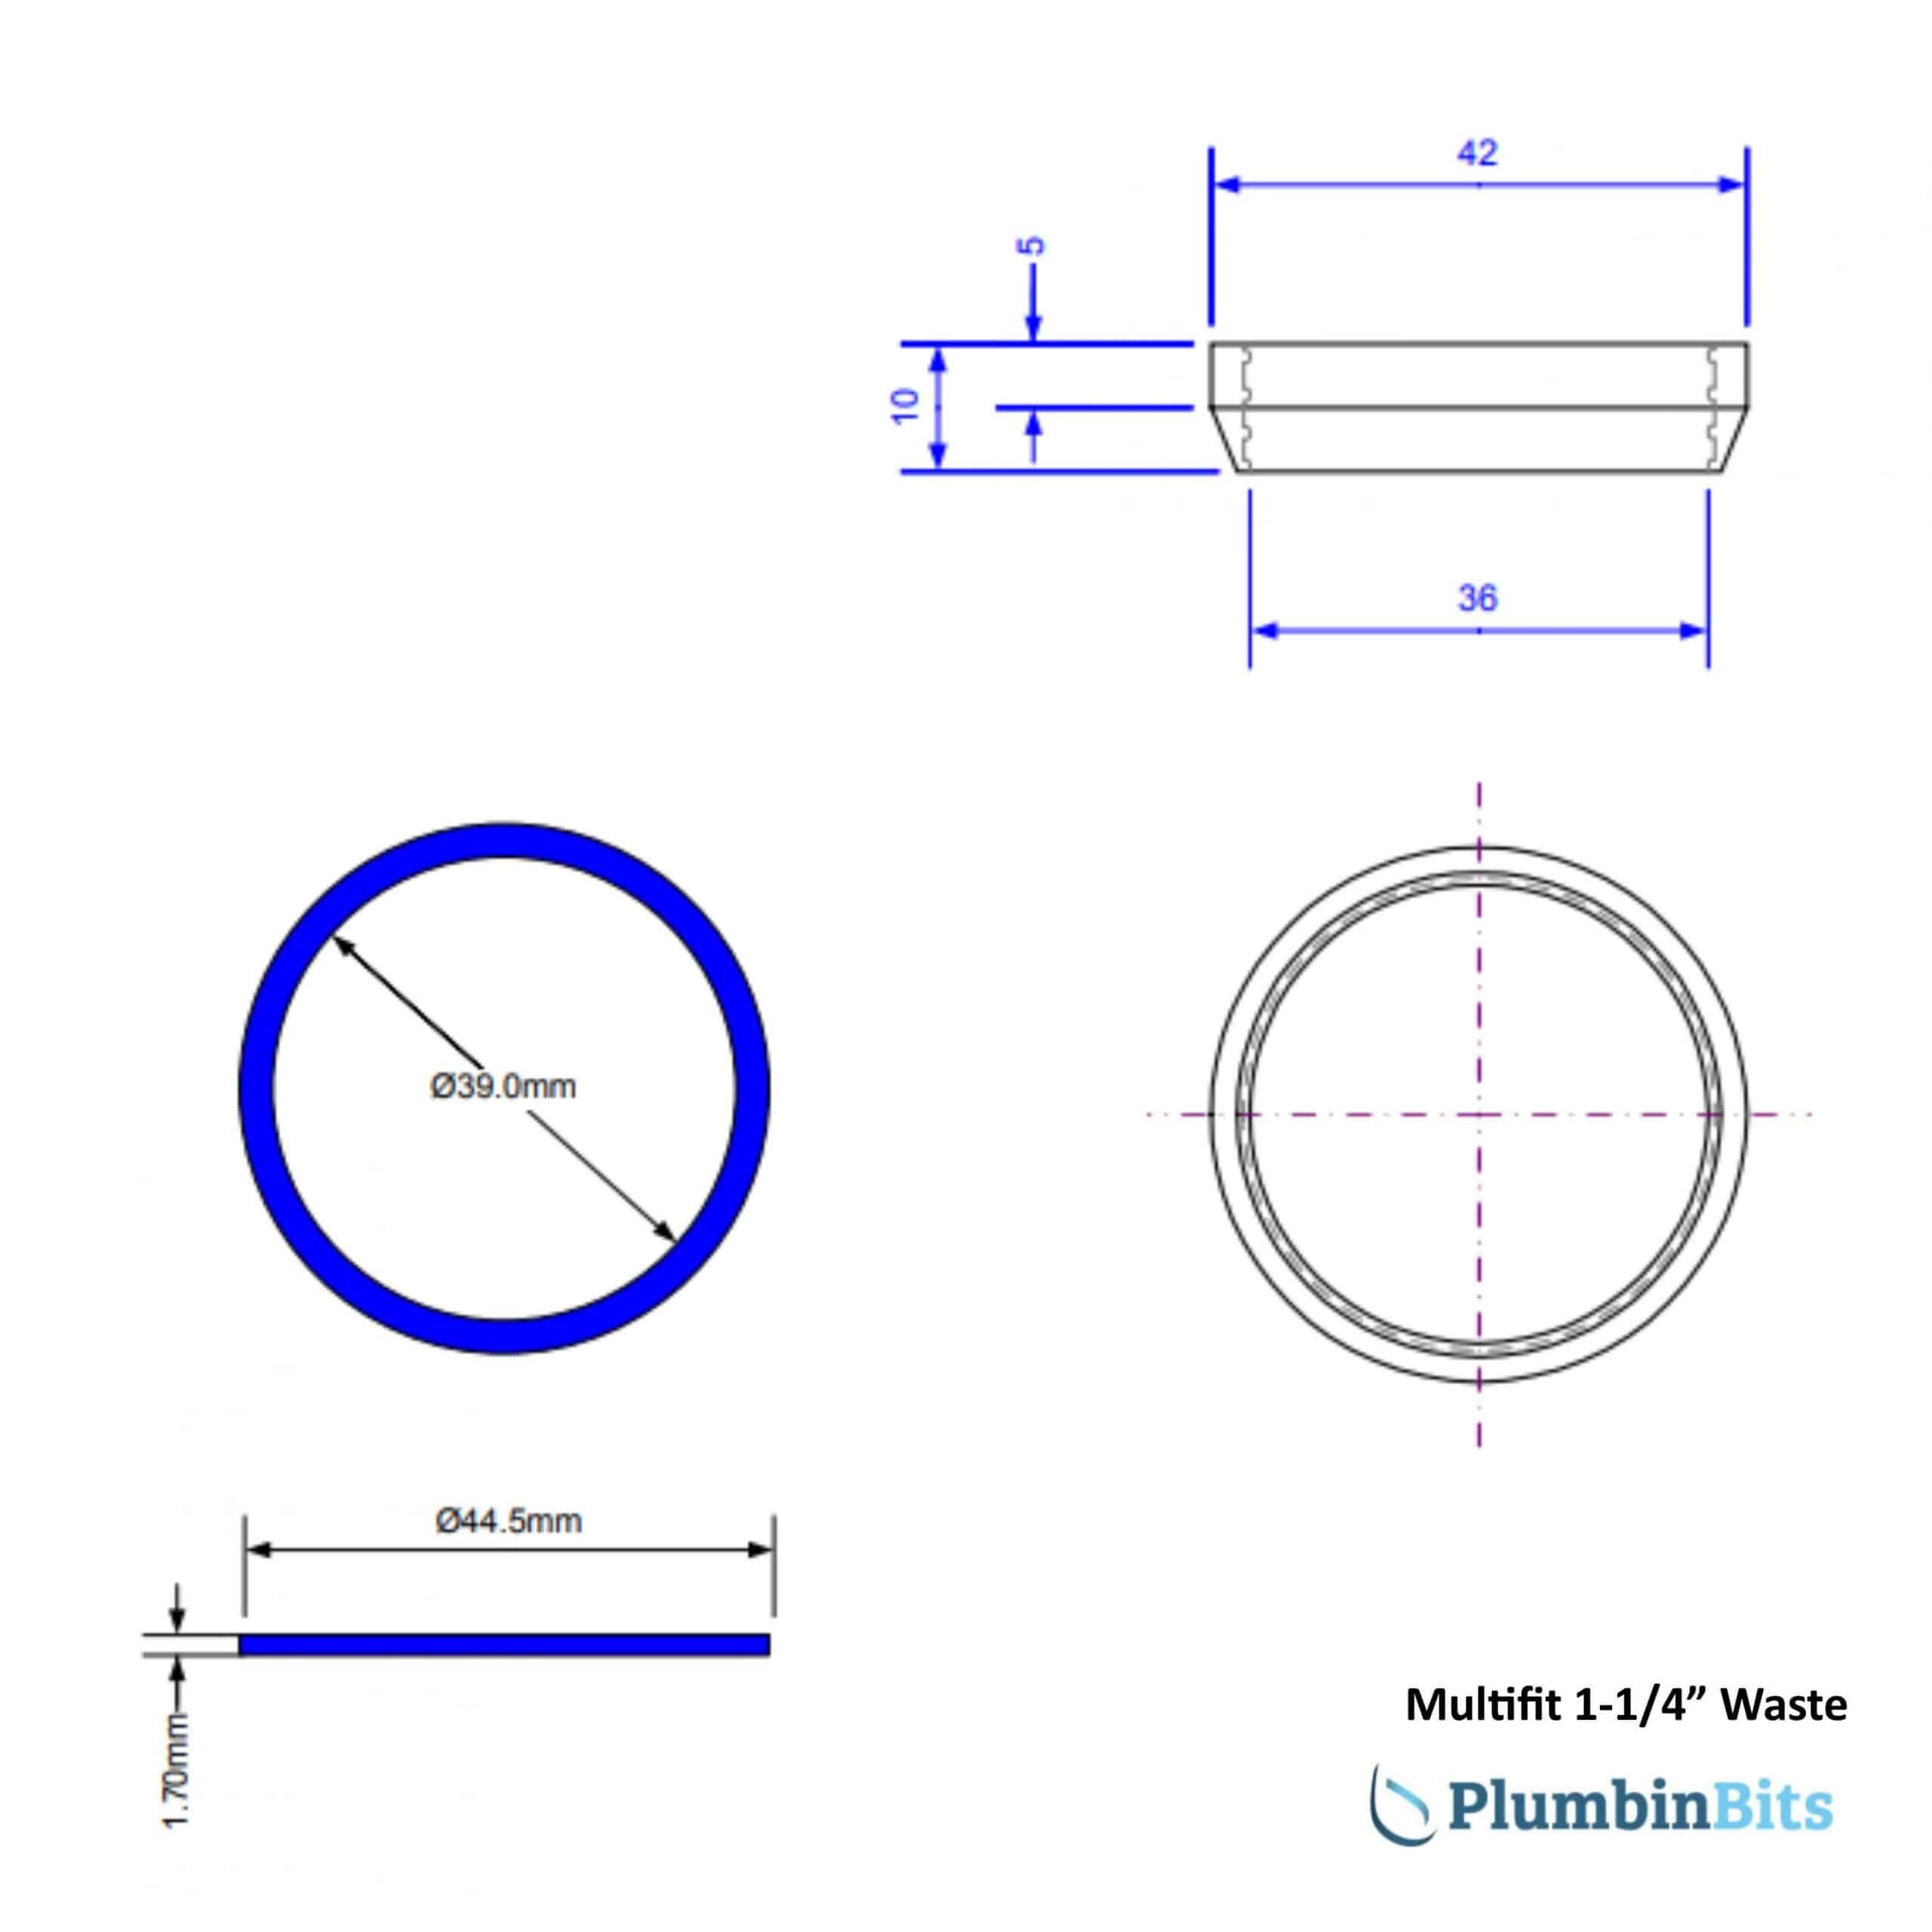 "McAlpine 1-1/4"" Multifit Washer Measurements"